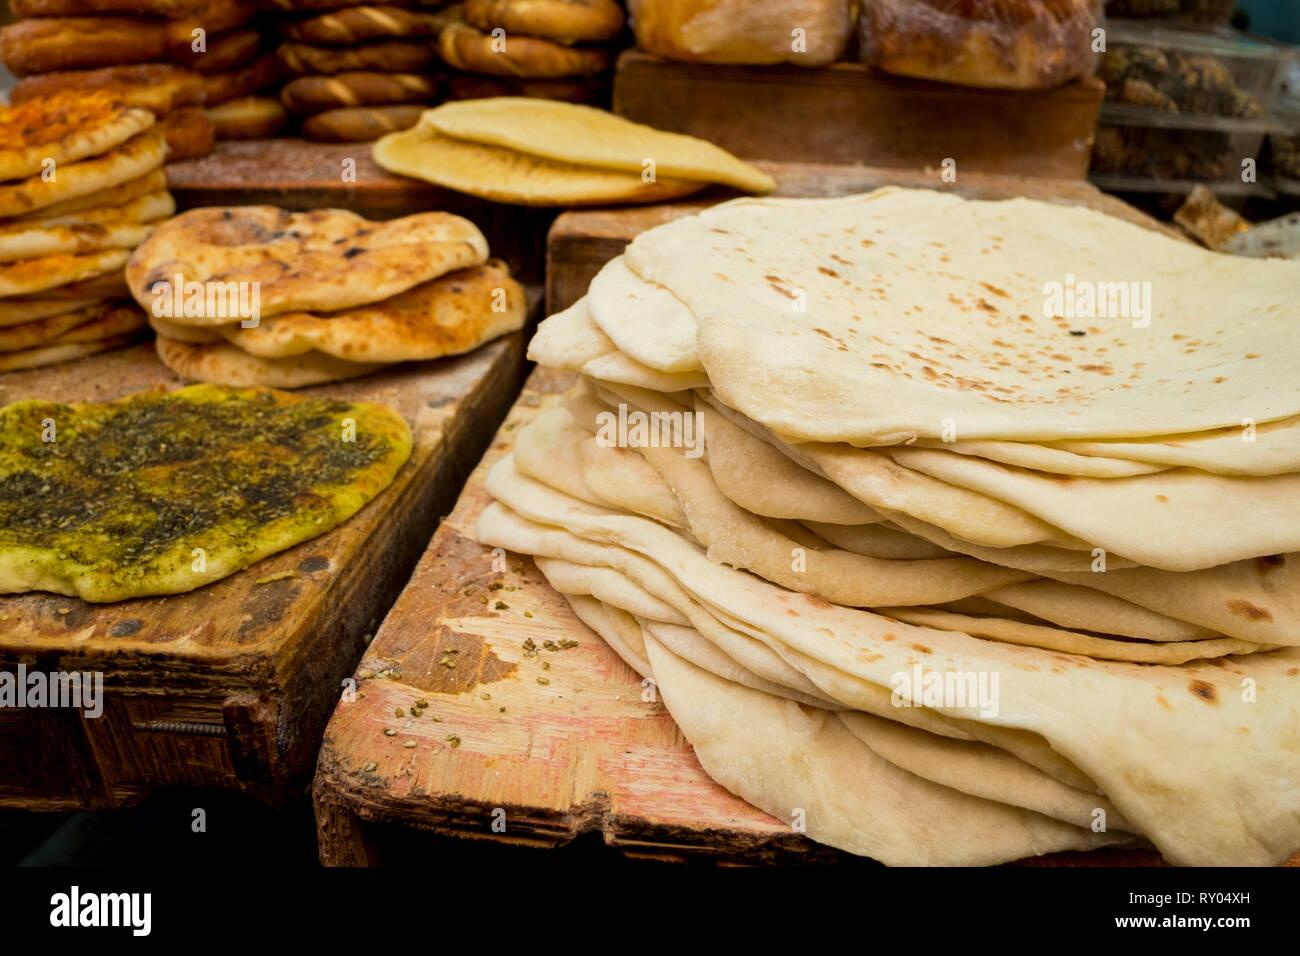 Fresh pita flat bread for sale at a Jewish market in Jerusalem, Israel. - Stock Image